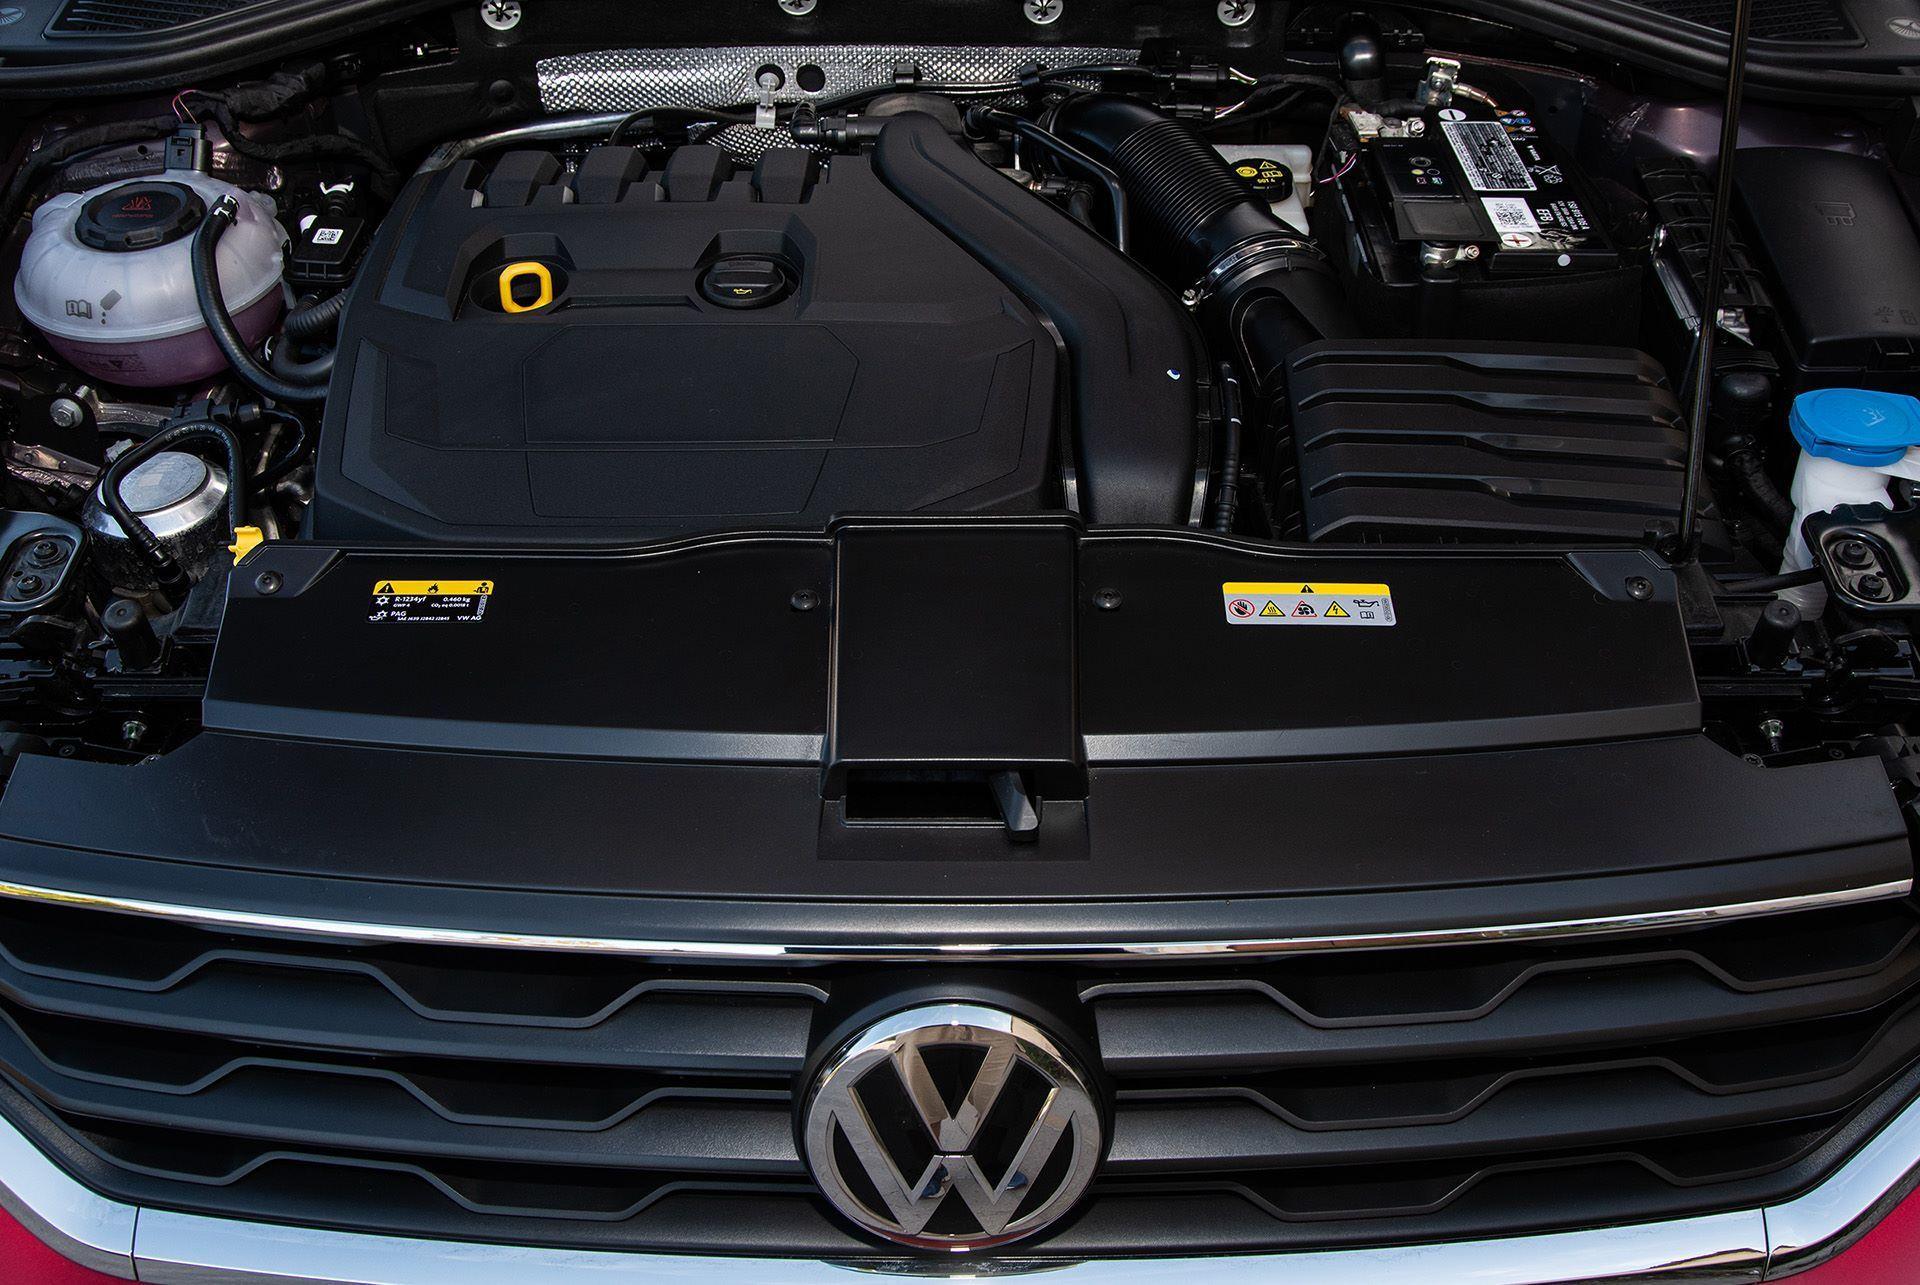 Volkswagen-T-Roc-Cabriolet-Greece-36